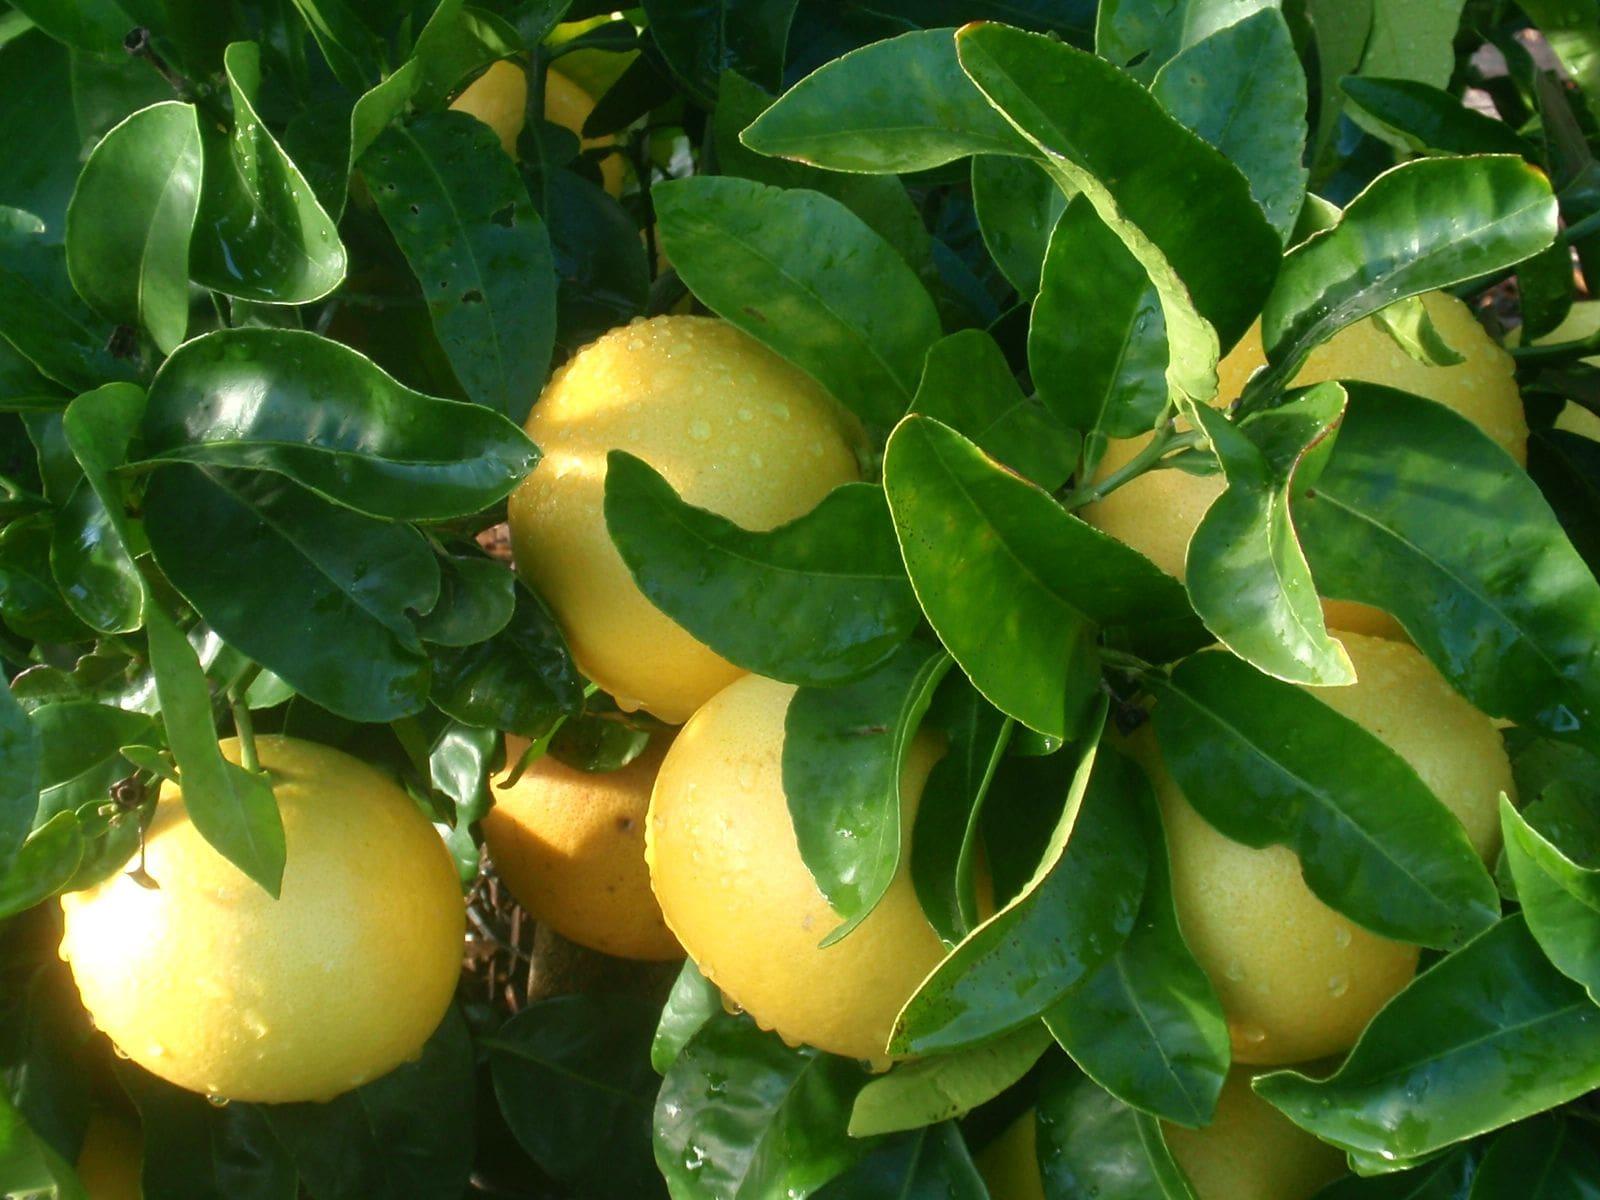 Pamplemousse blanc, white grapefruit